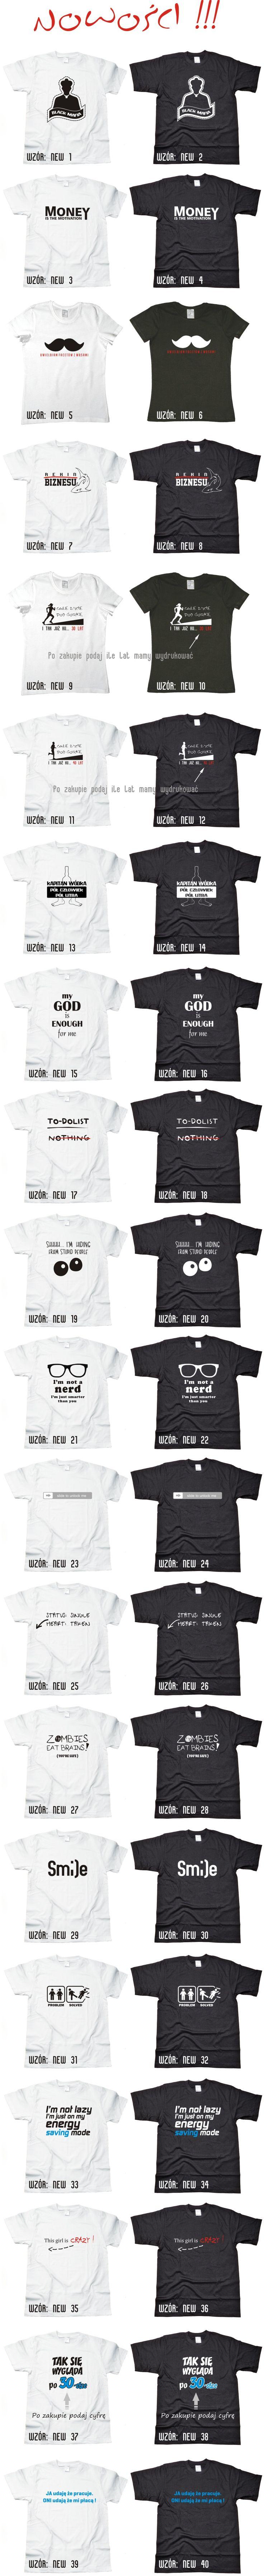 smieszne koszulki